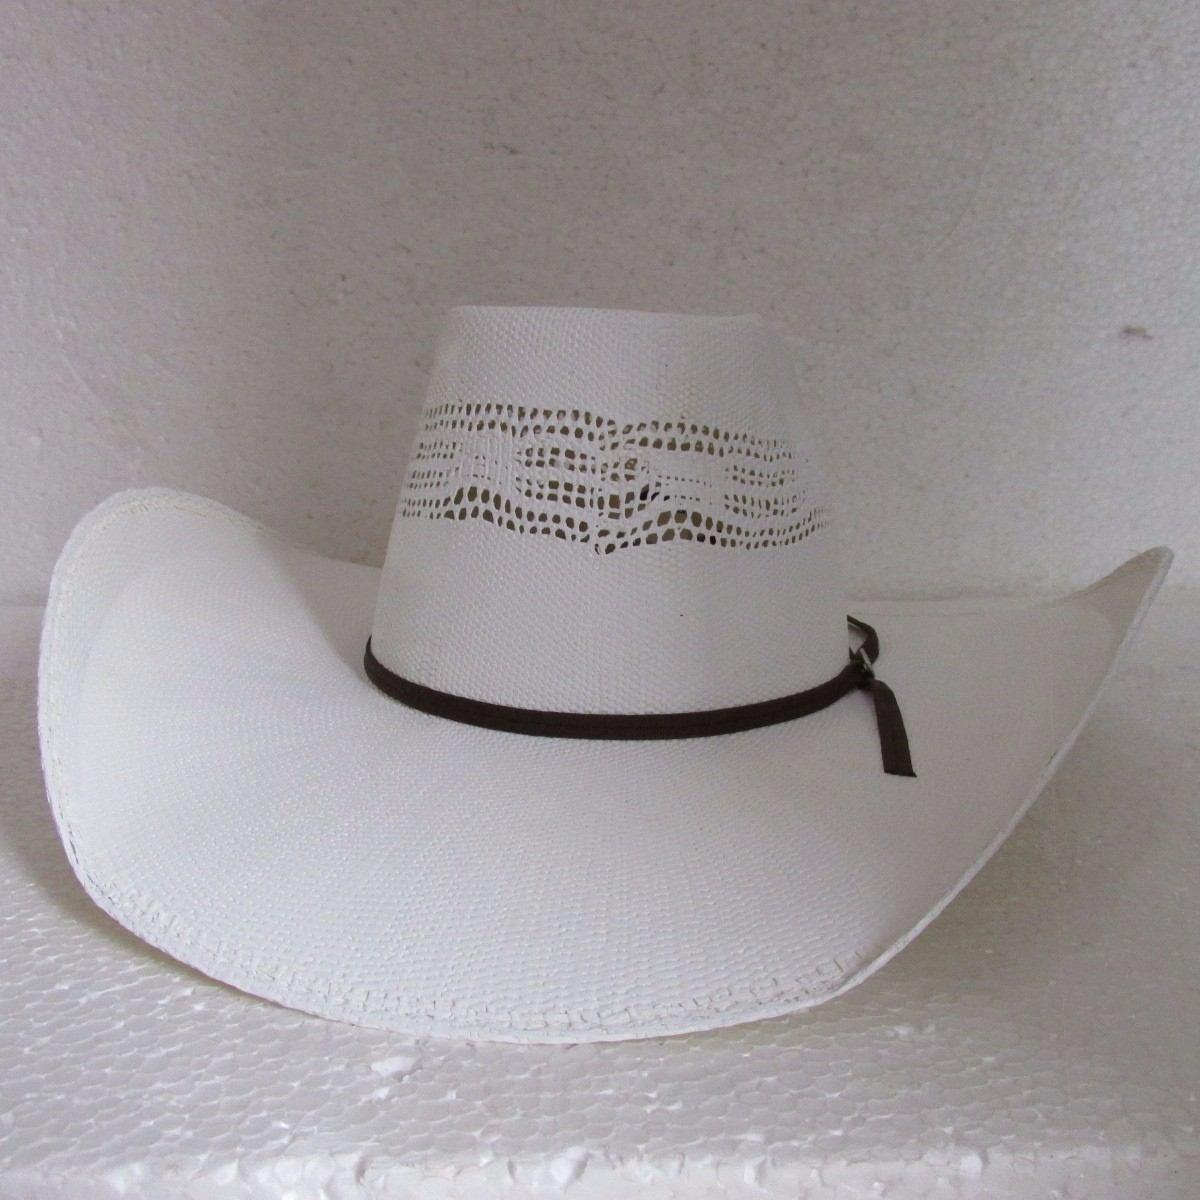 chapéu palha marcatto country aba 12cm cor mªrfim nº57. Carregando zoom. 3a1809f5978